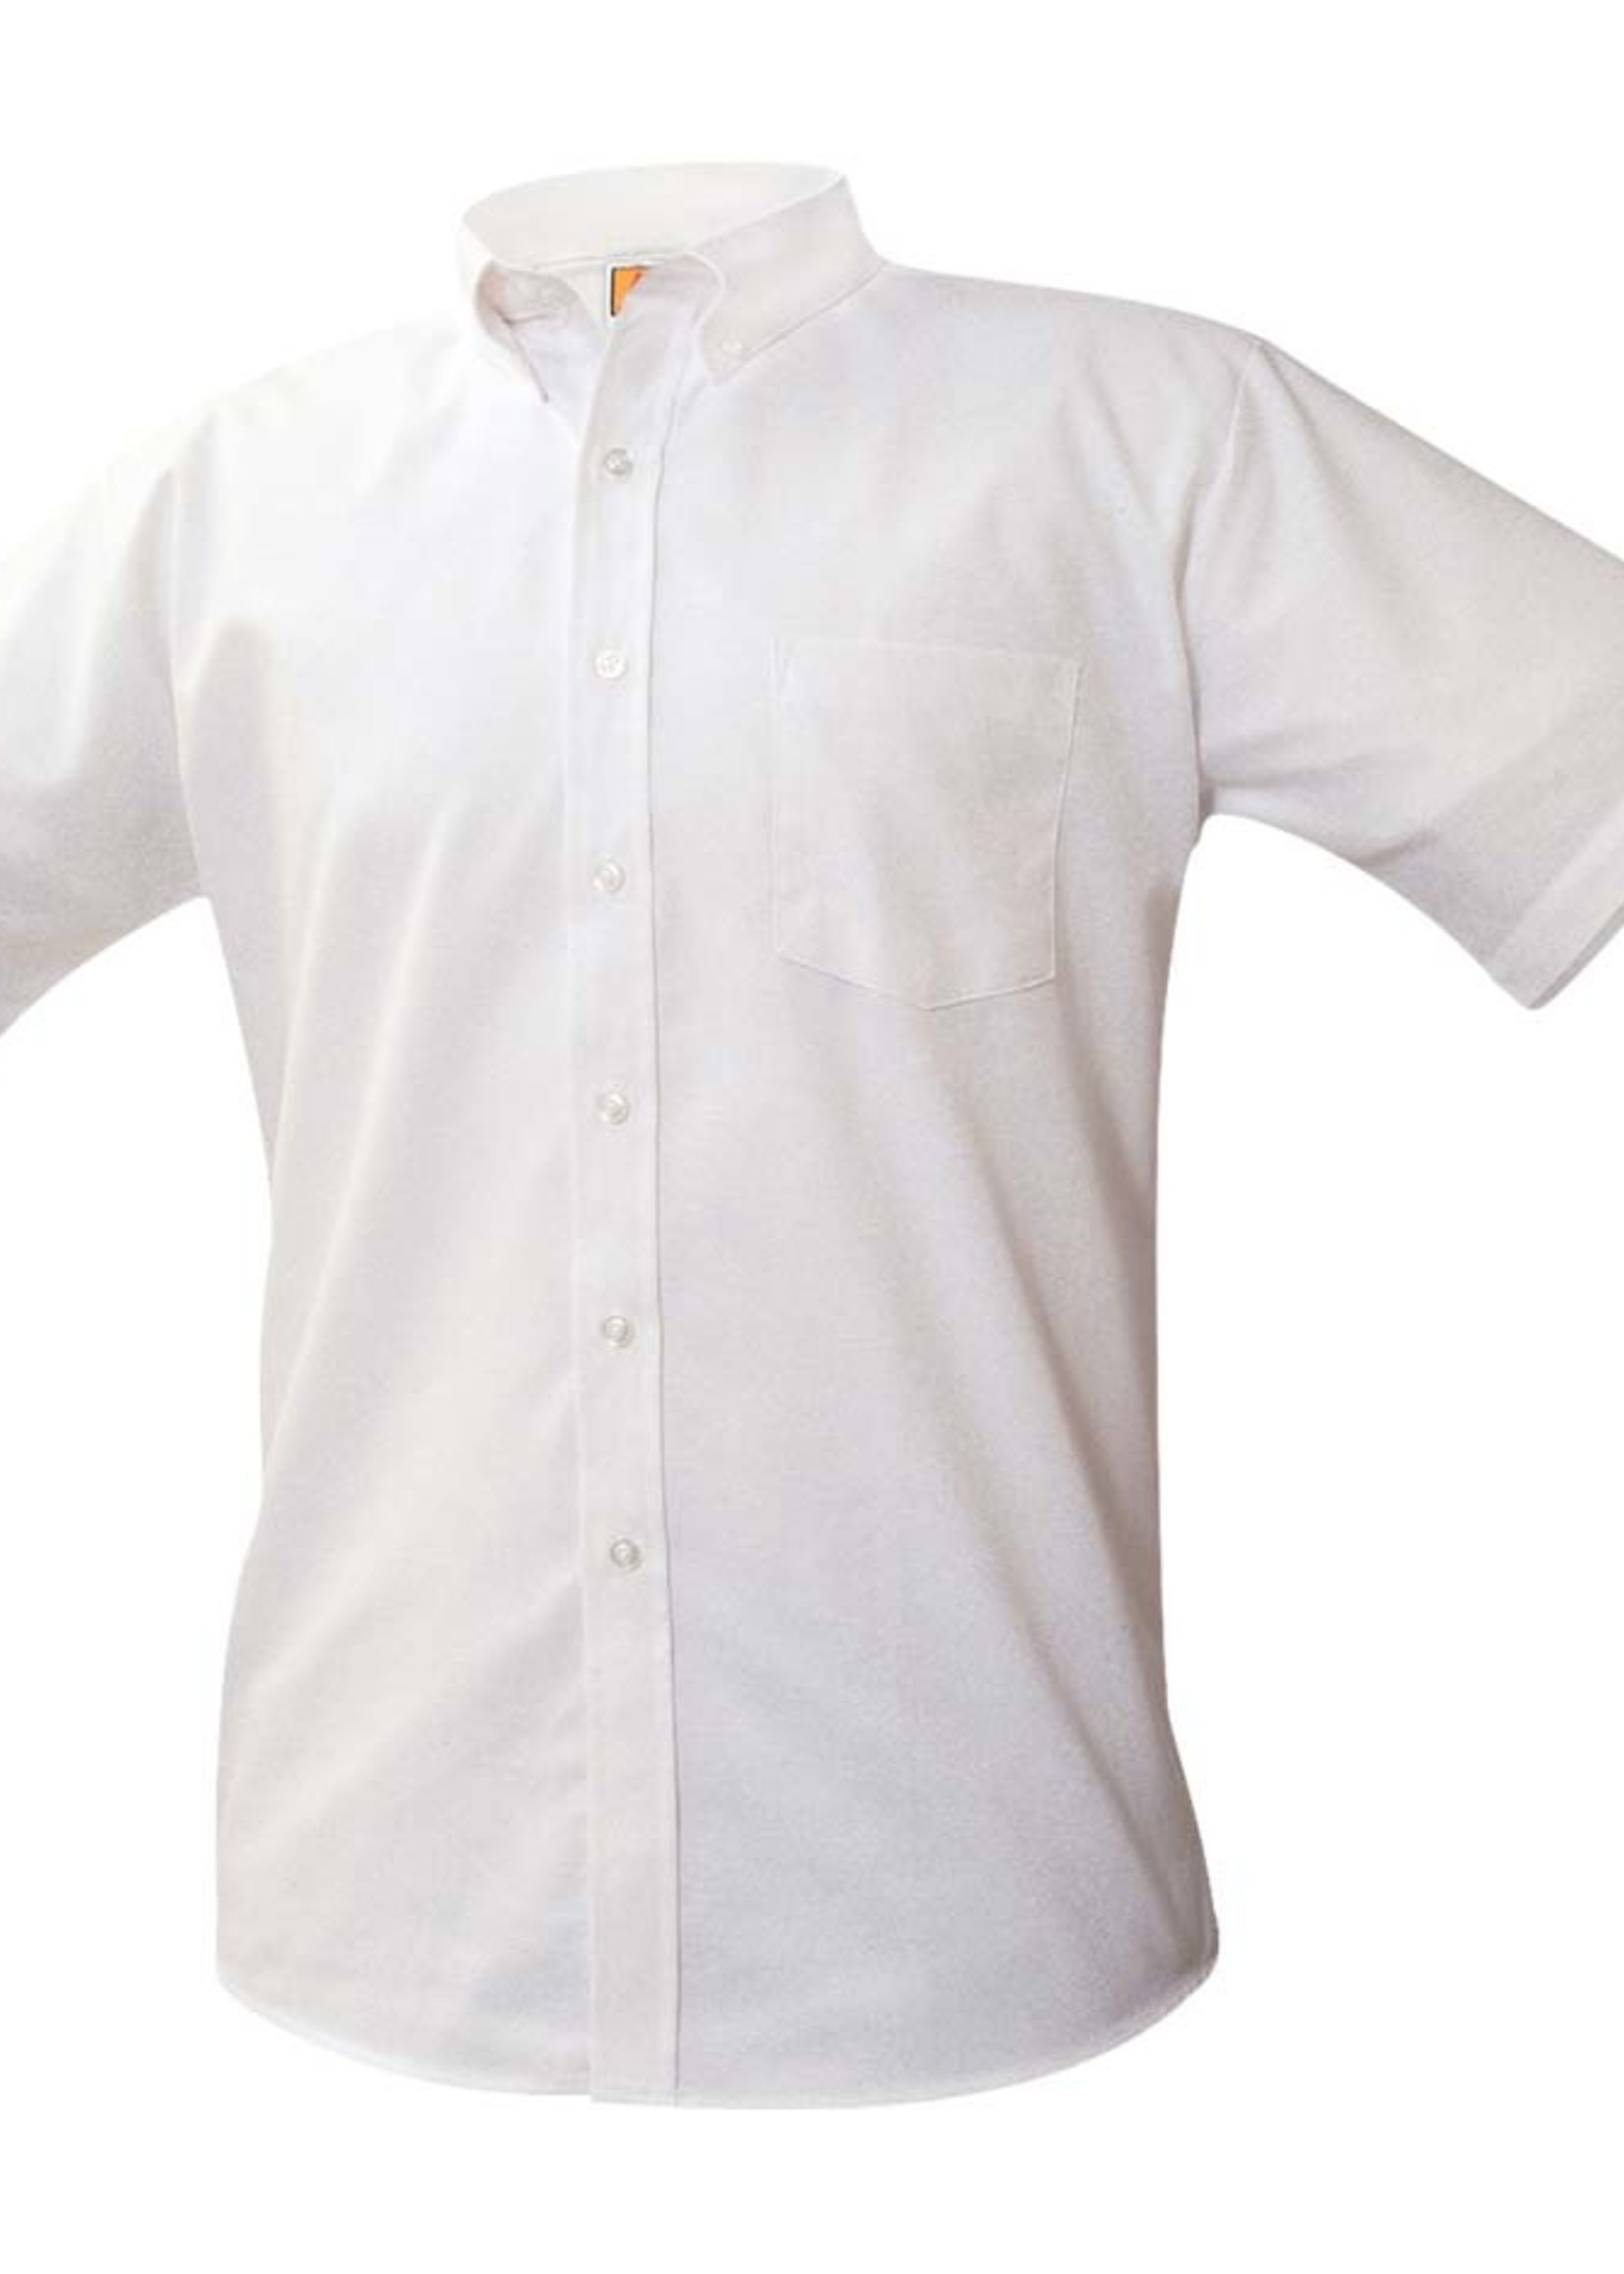 A+ Short Sleeve White Oxford Shirt LO